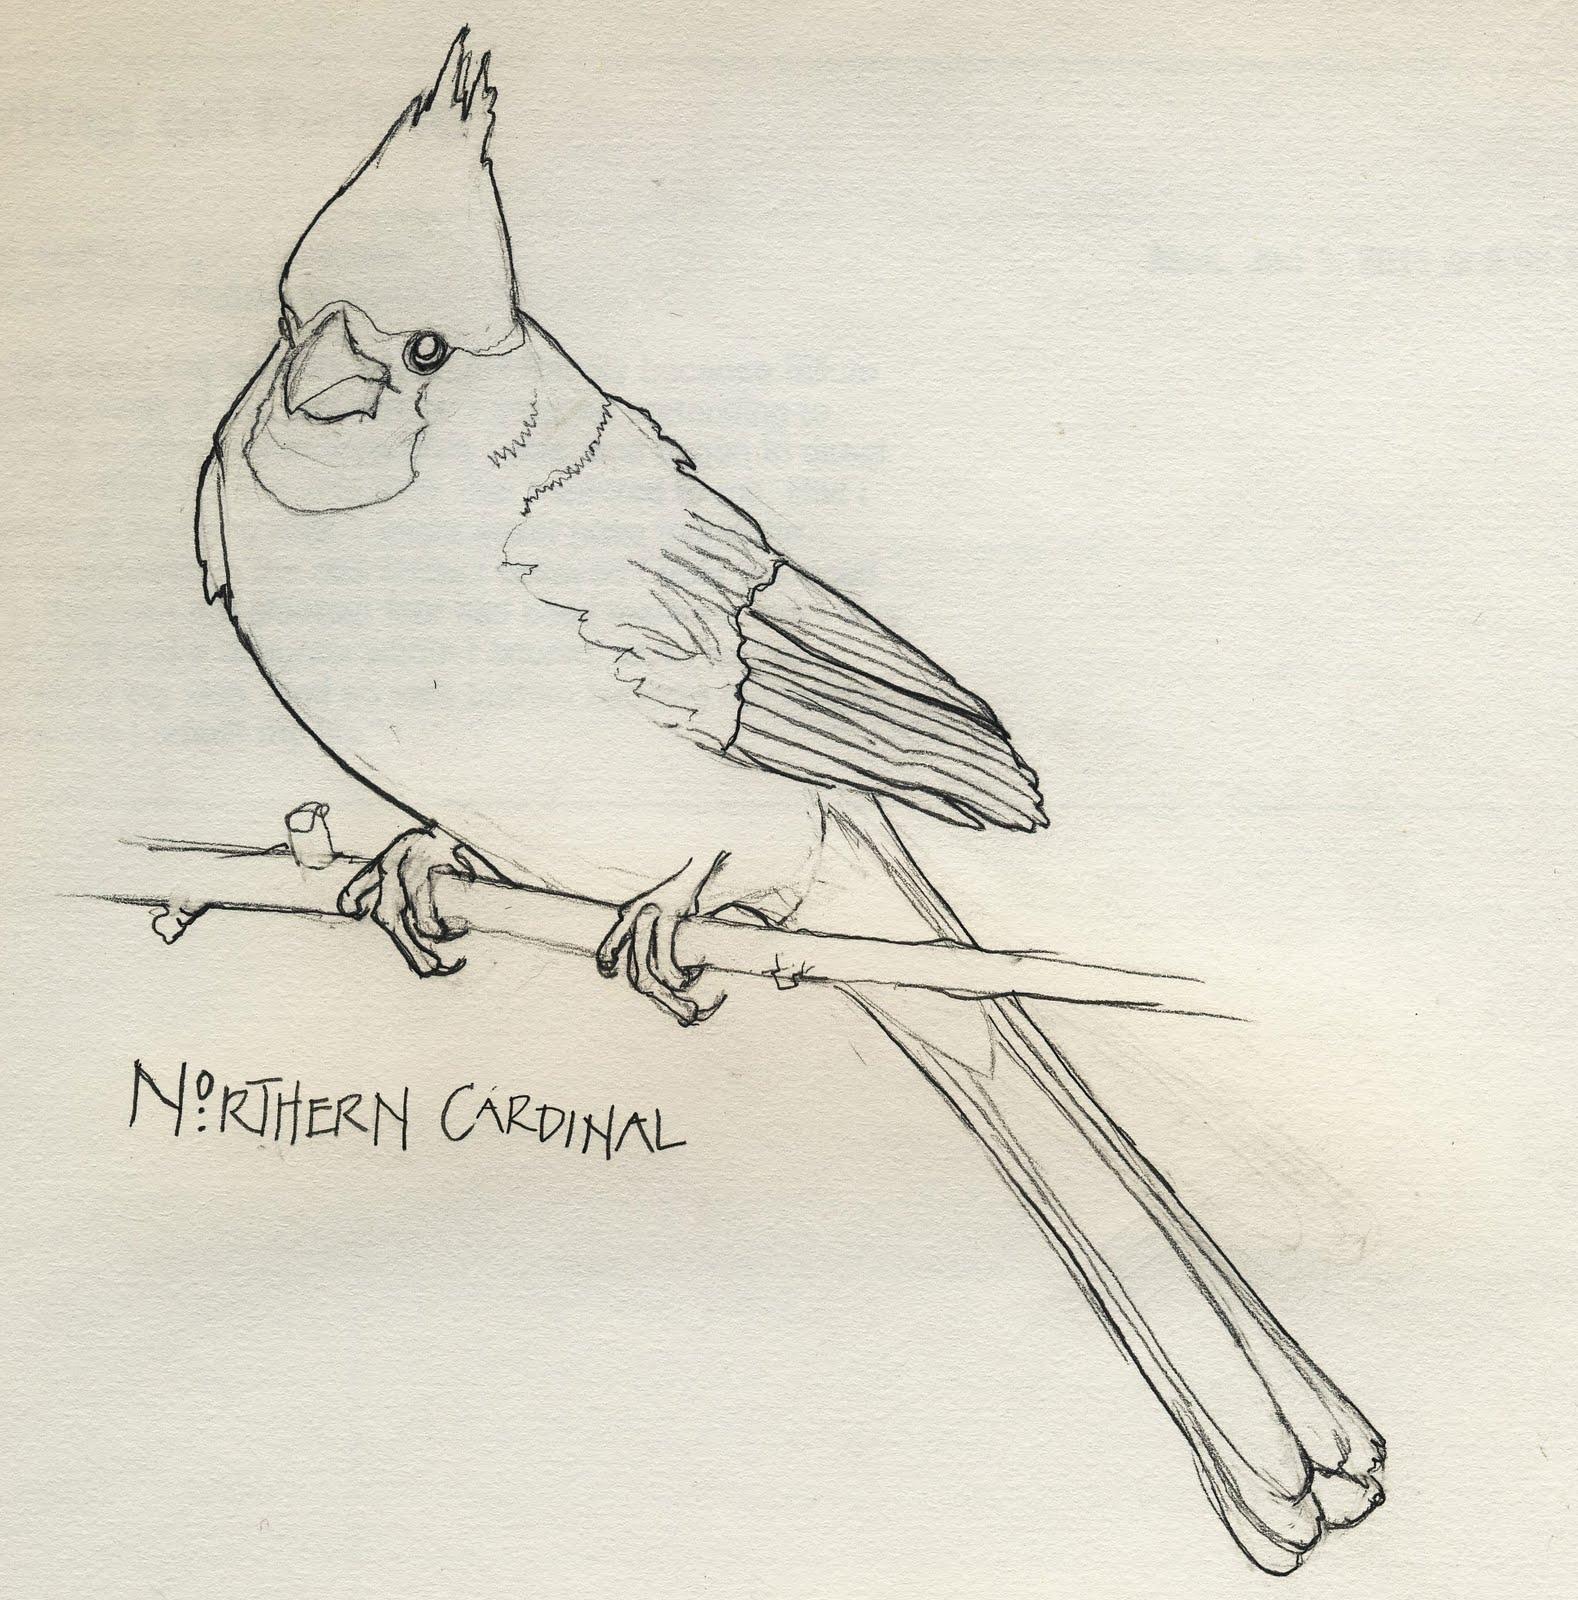 1578x1600 Birdly Drawn Northern Cardinal Line Drawing